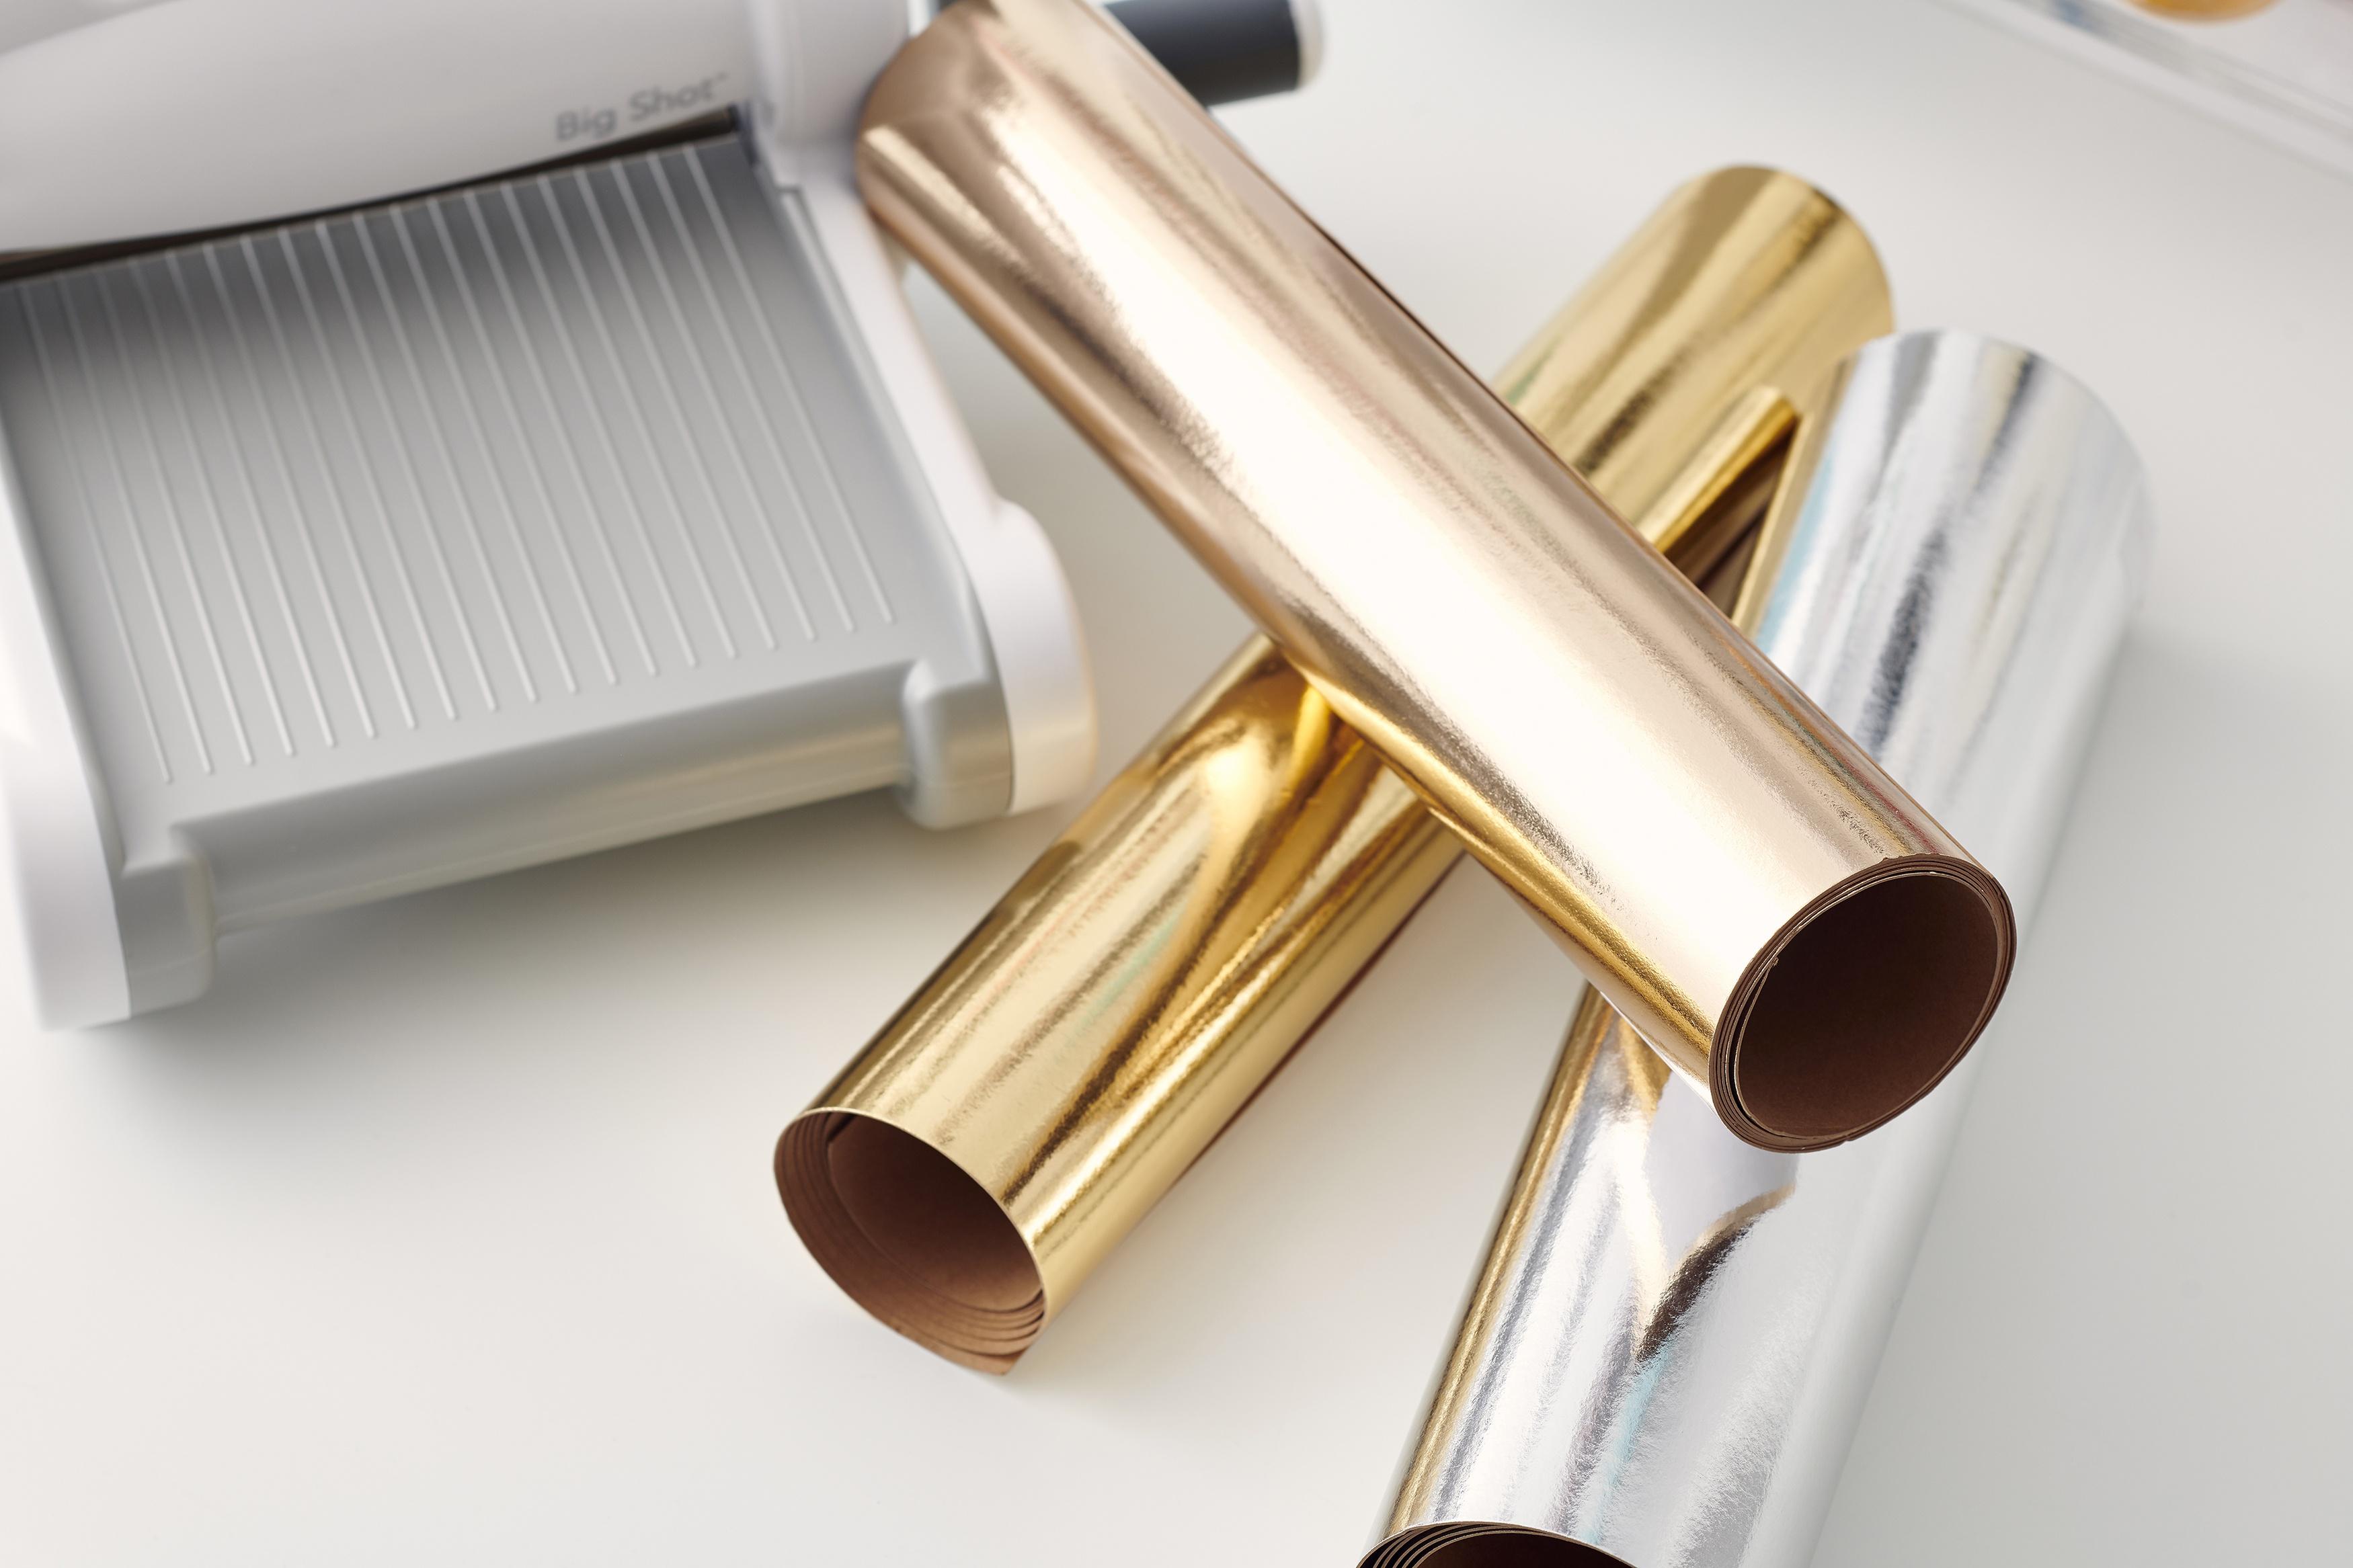 Sizzix Surfacez Texture Roll 12X48-Gold